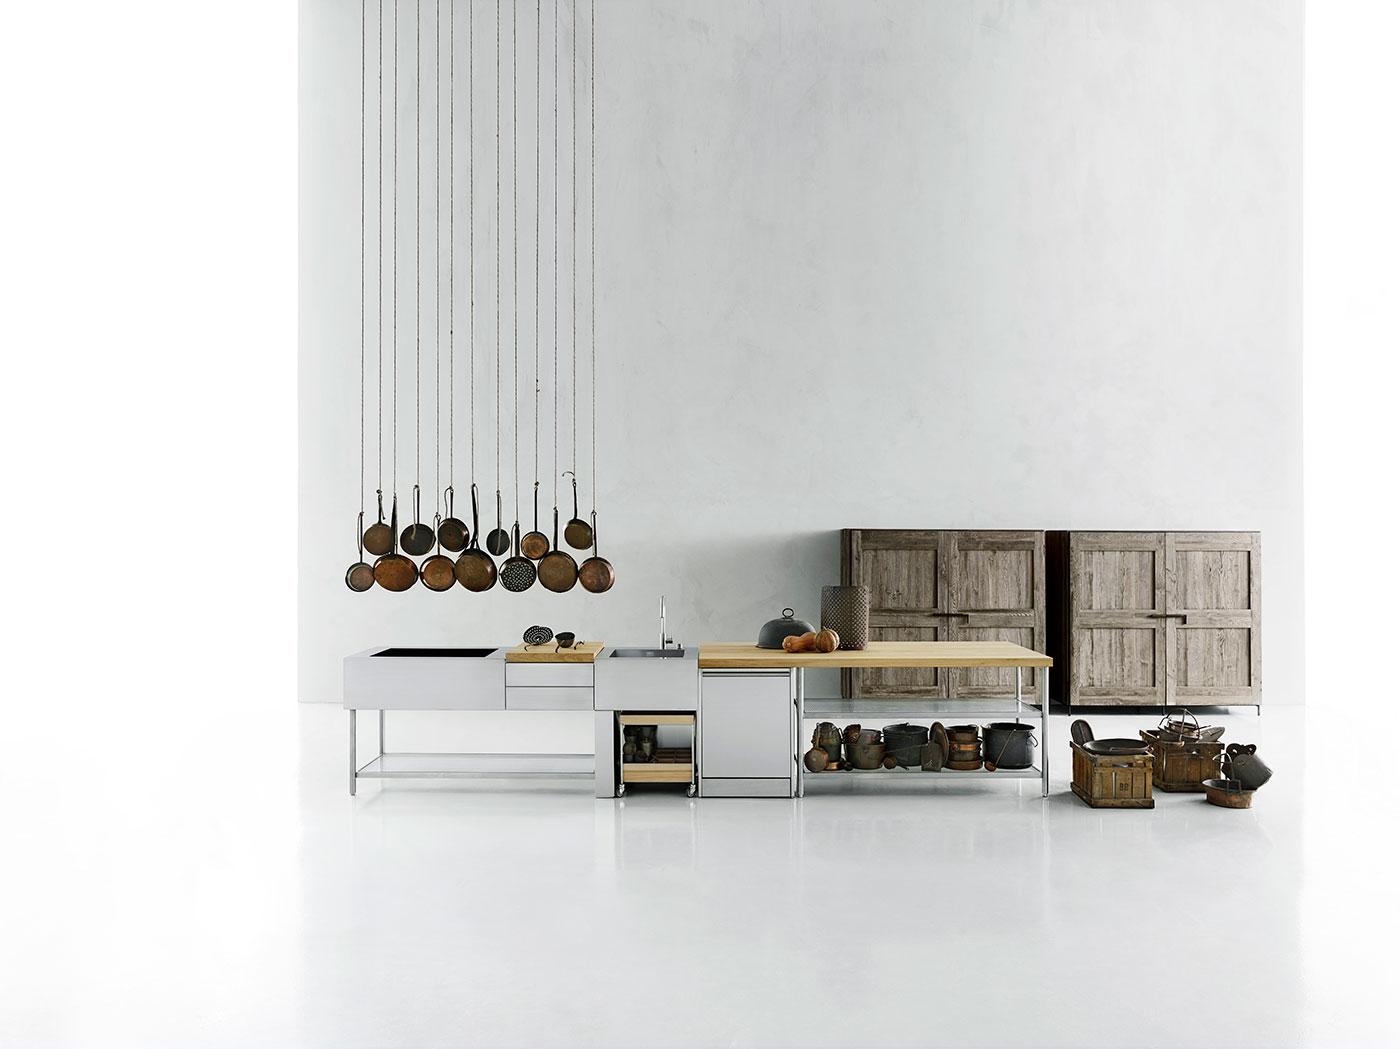 Obegi Home Boffi Open Kitchen By Tommasosartori High